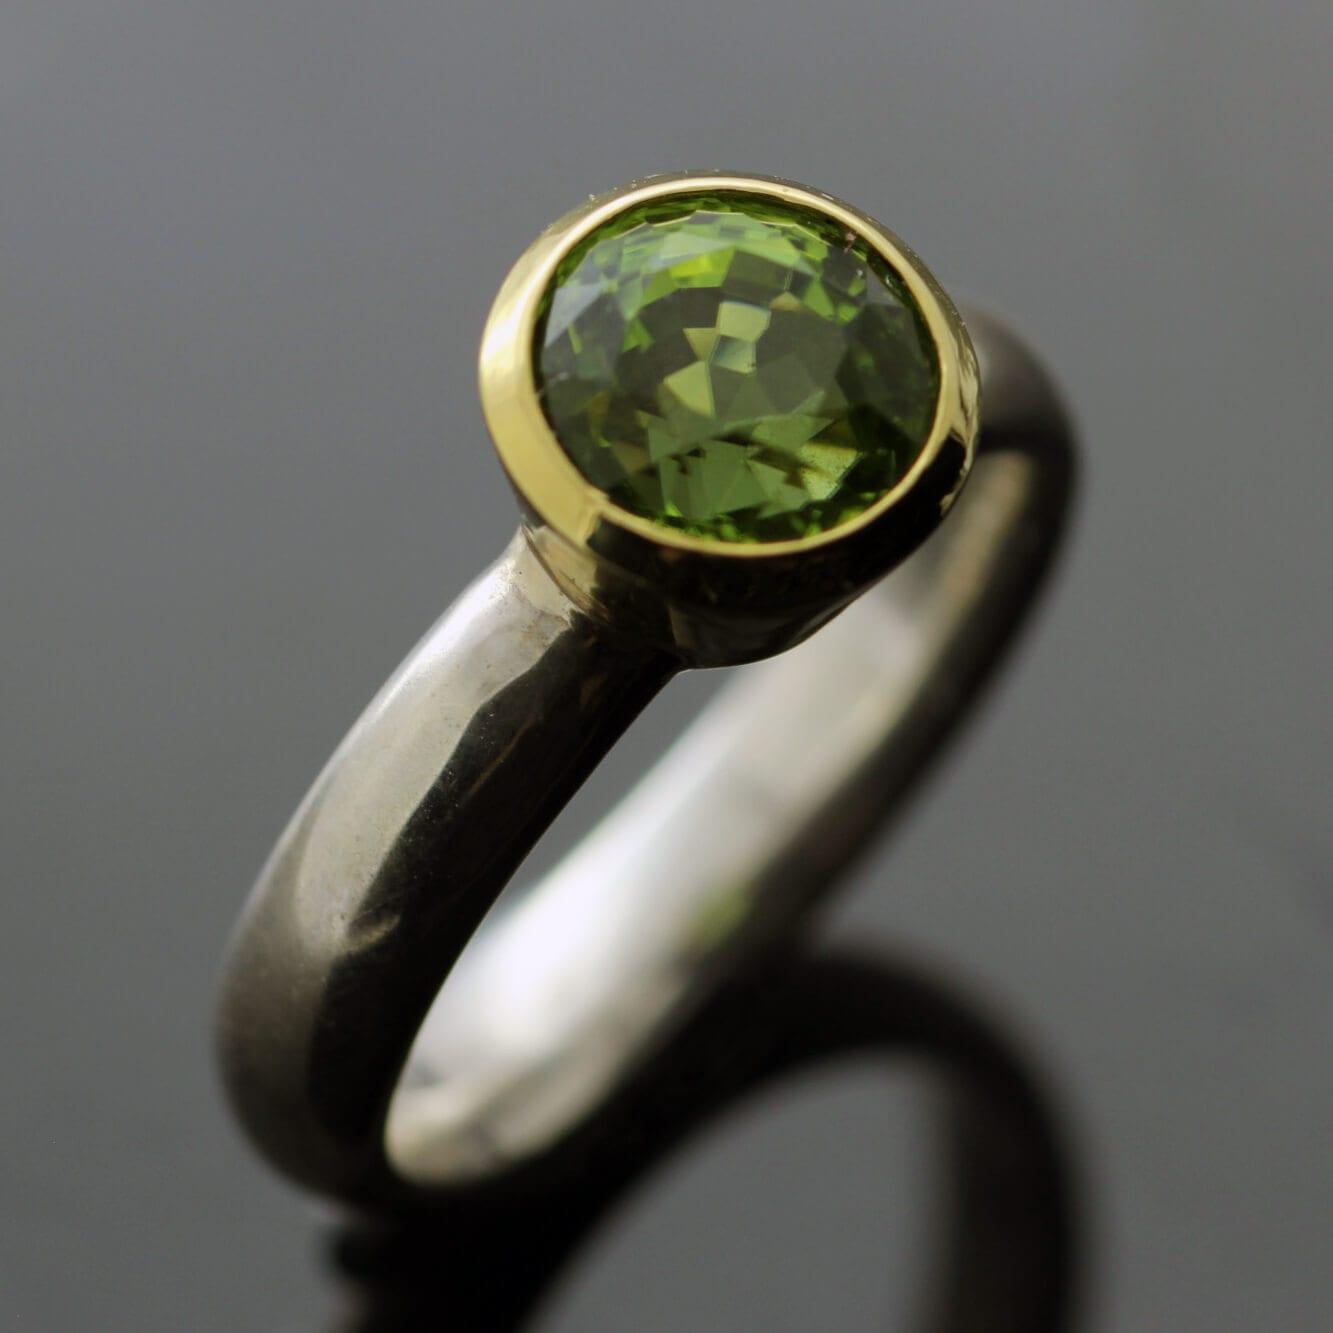 Peridot round brilliant cut modern statement Yellow Gold Sterling Silver ring